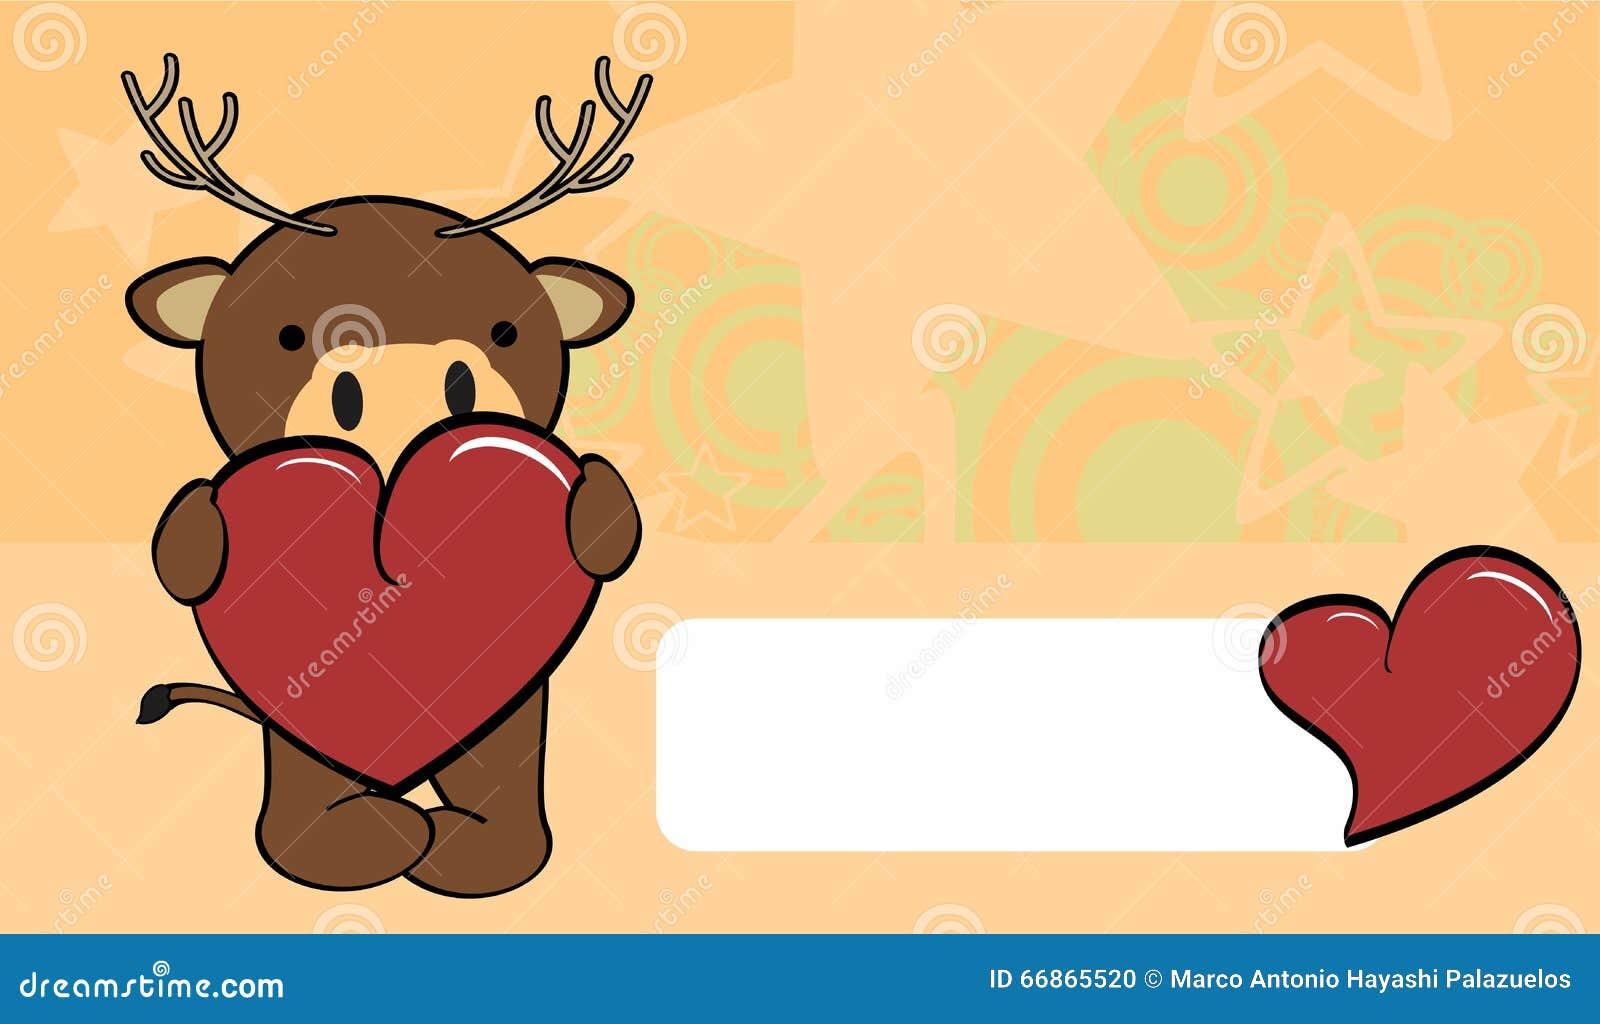 Cute Baby Deer Cartoon Valentine Love Card Stock Vector ...